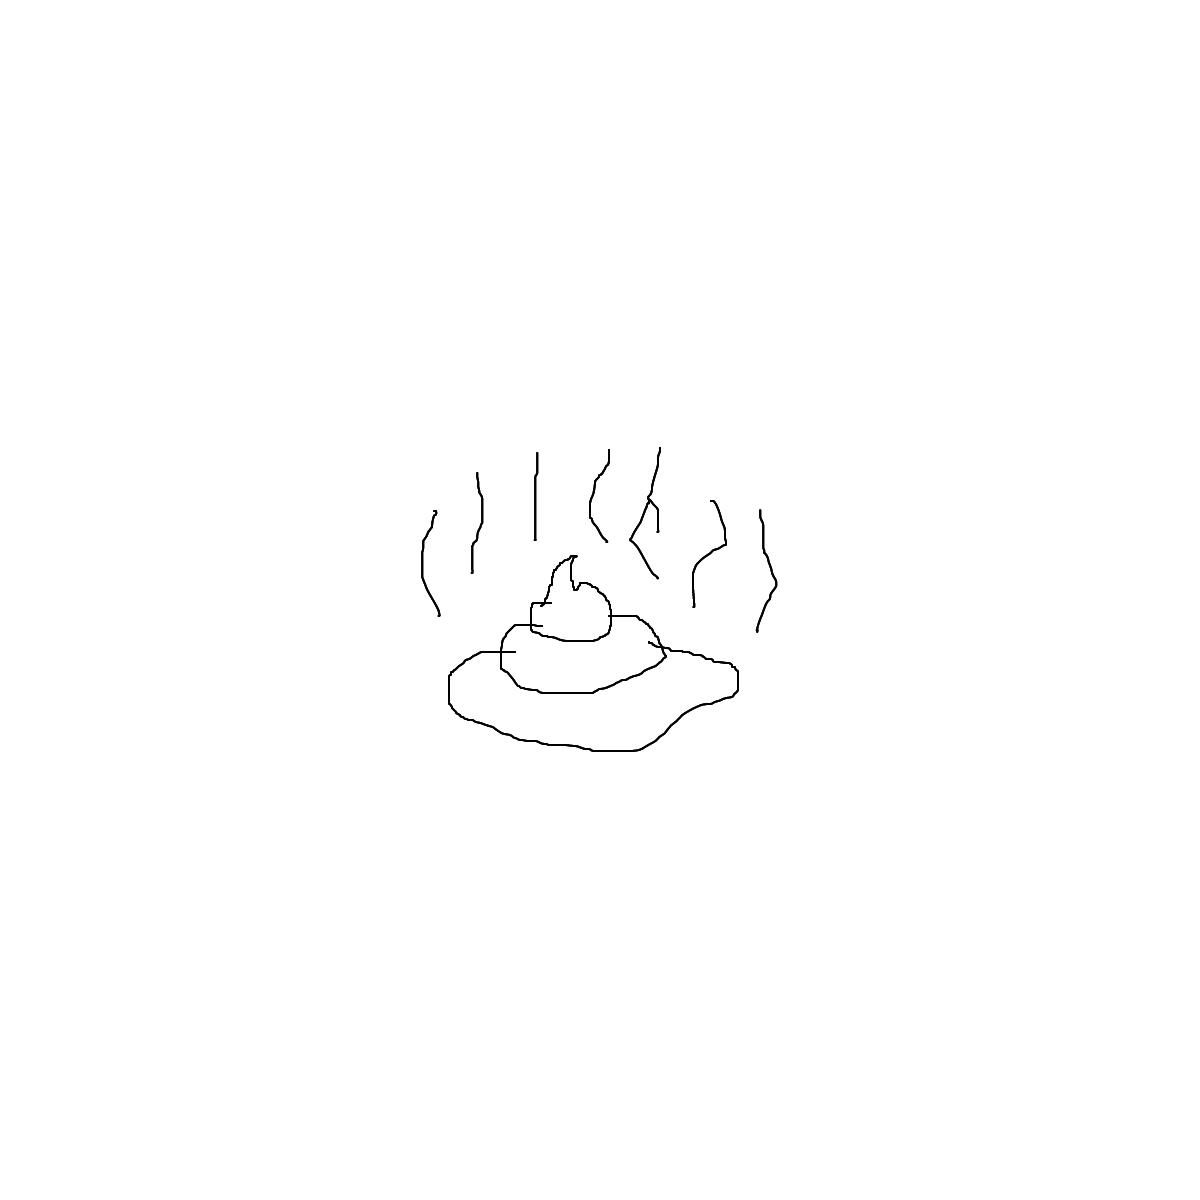 BAAAM drawing#2898 lat:30.2651081085205080lng: -97.7574462890625000